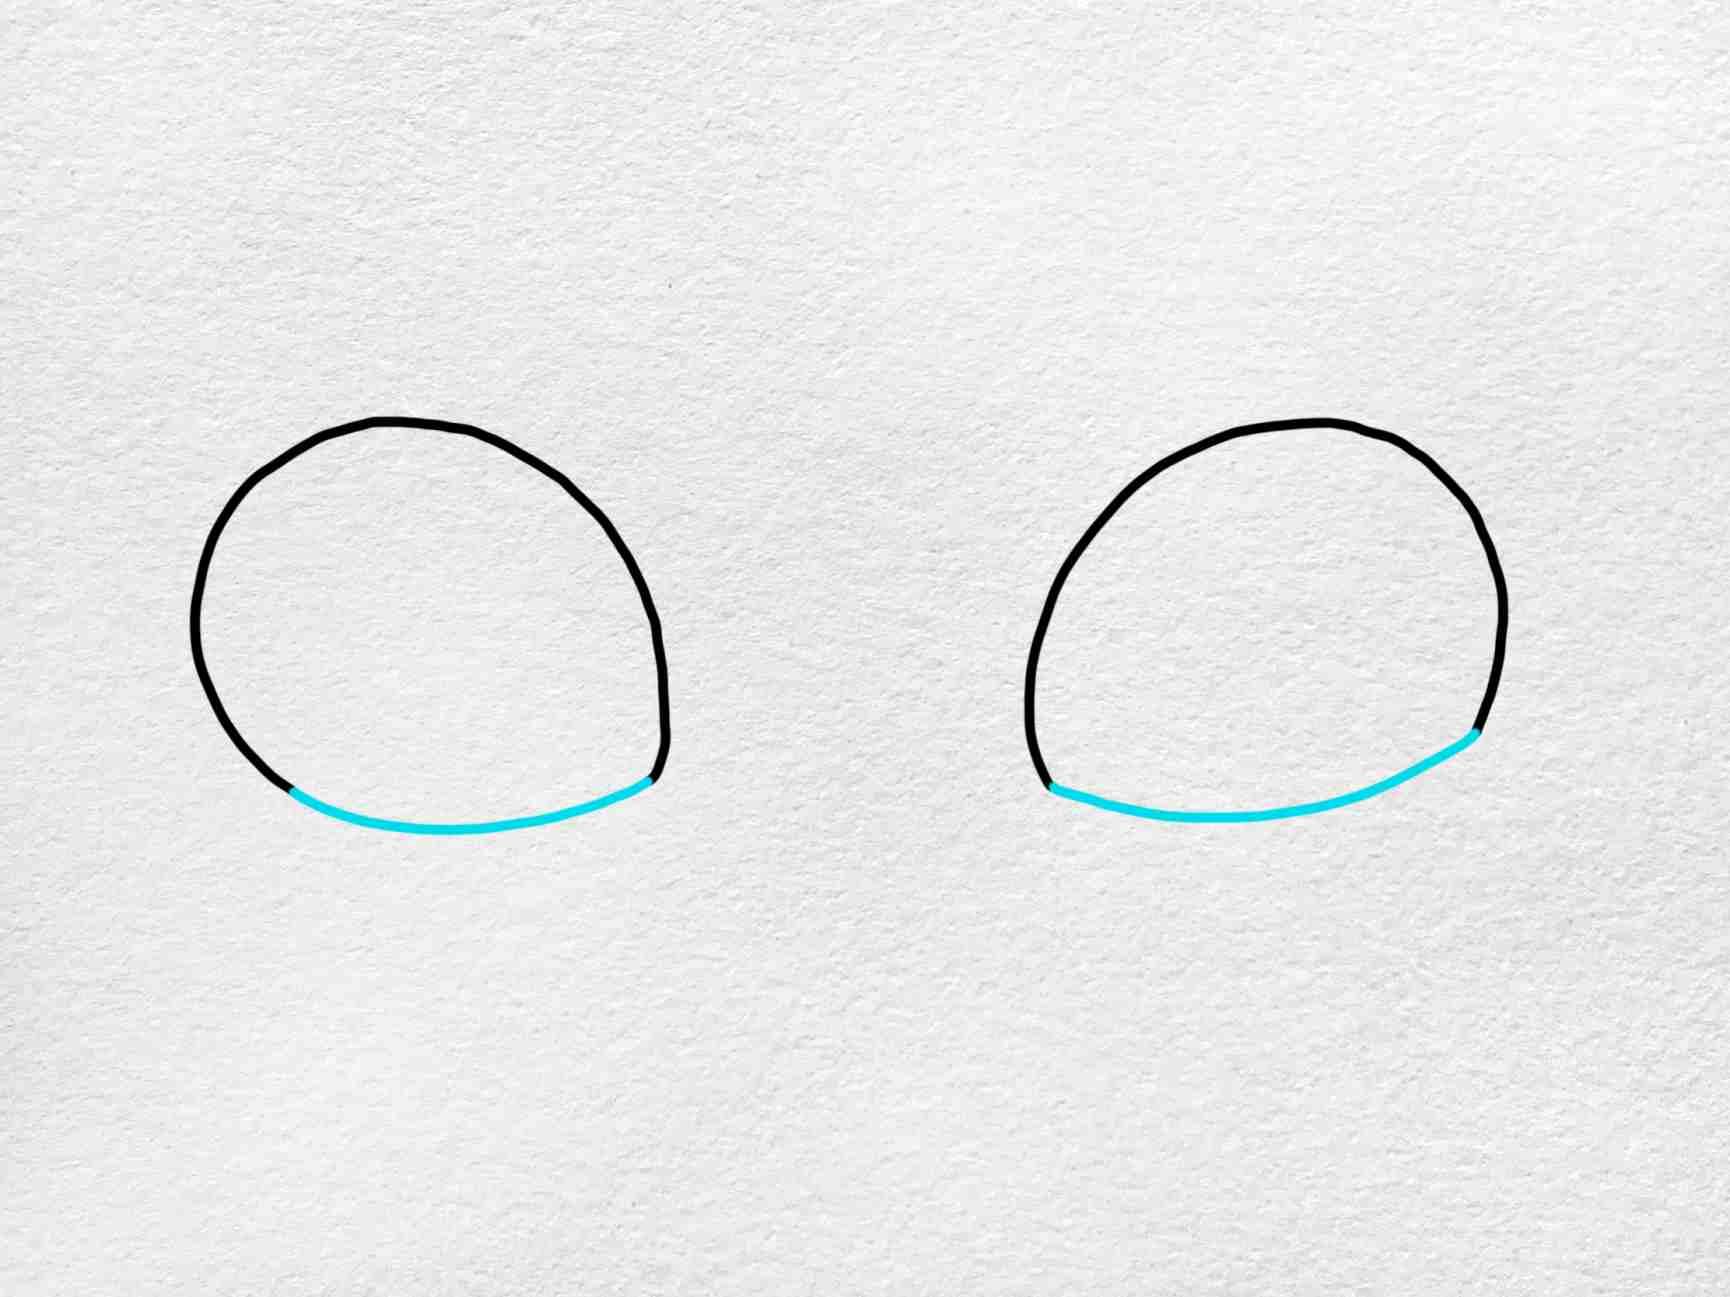 Cat Eyes Drawing: Step 2